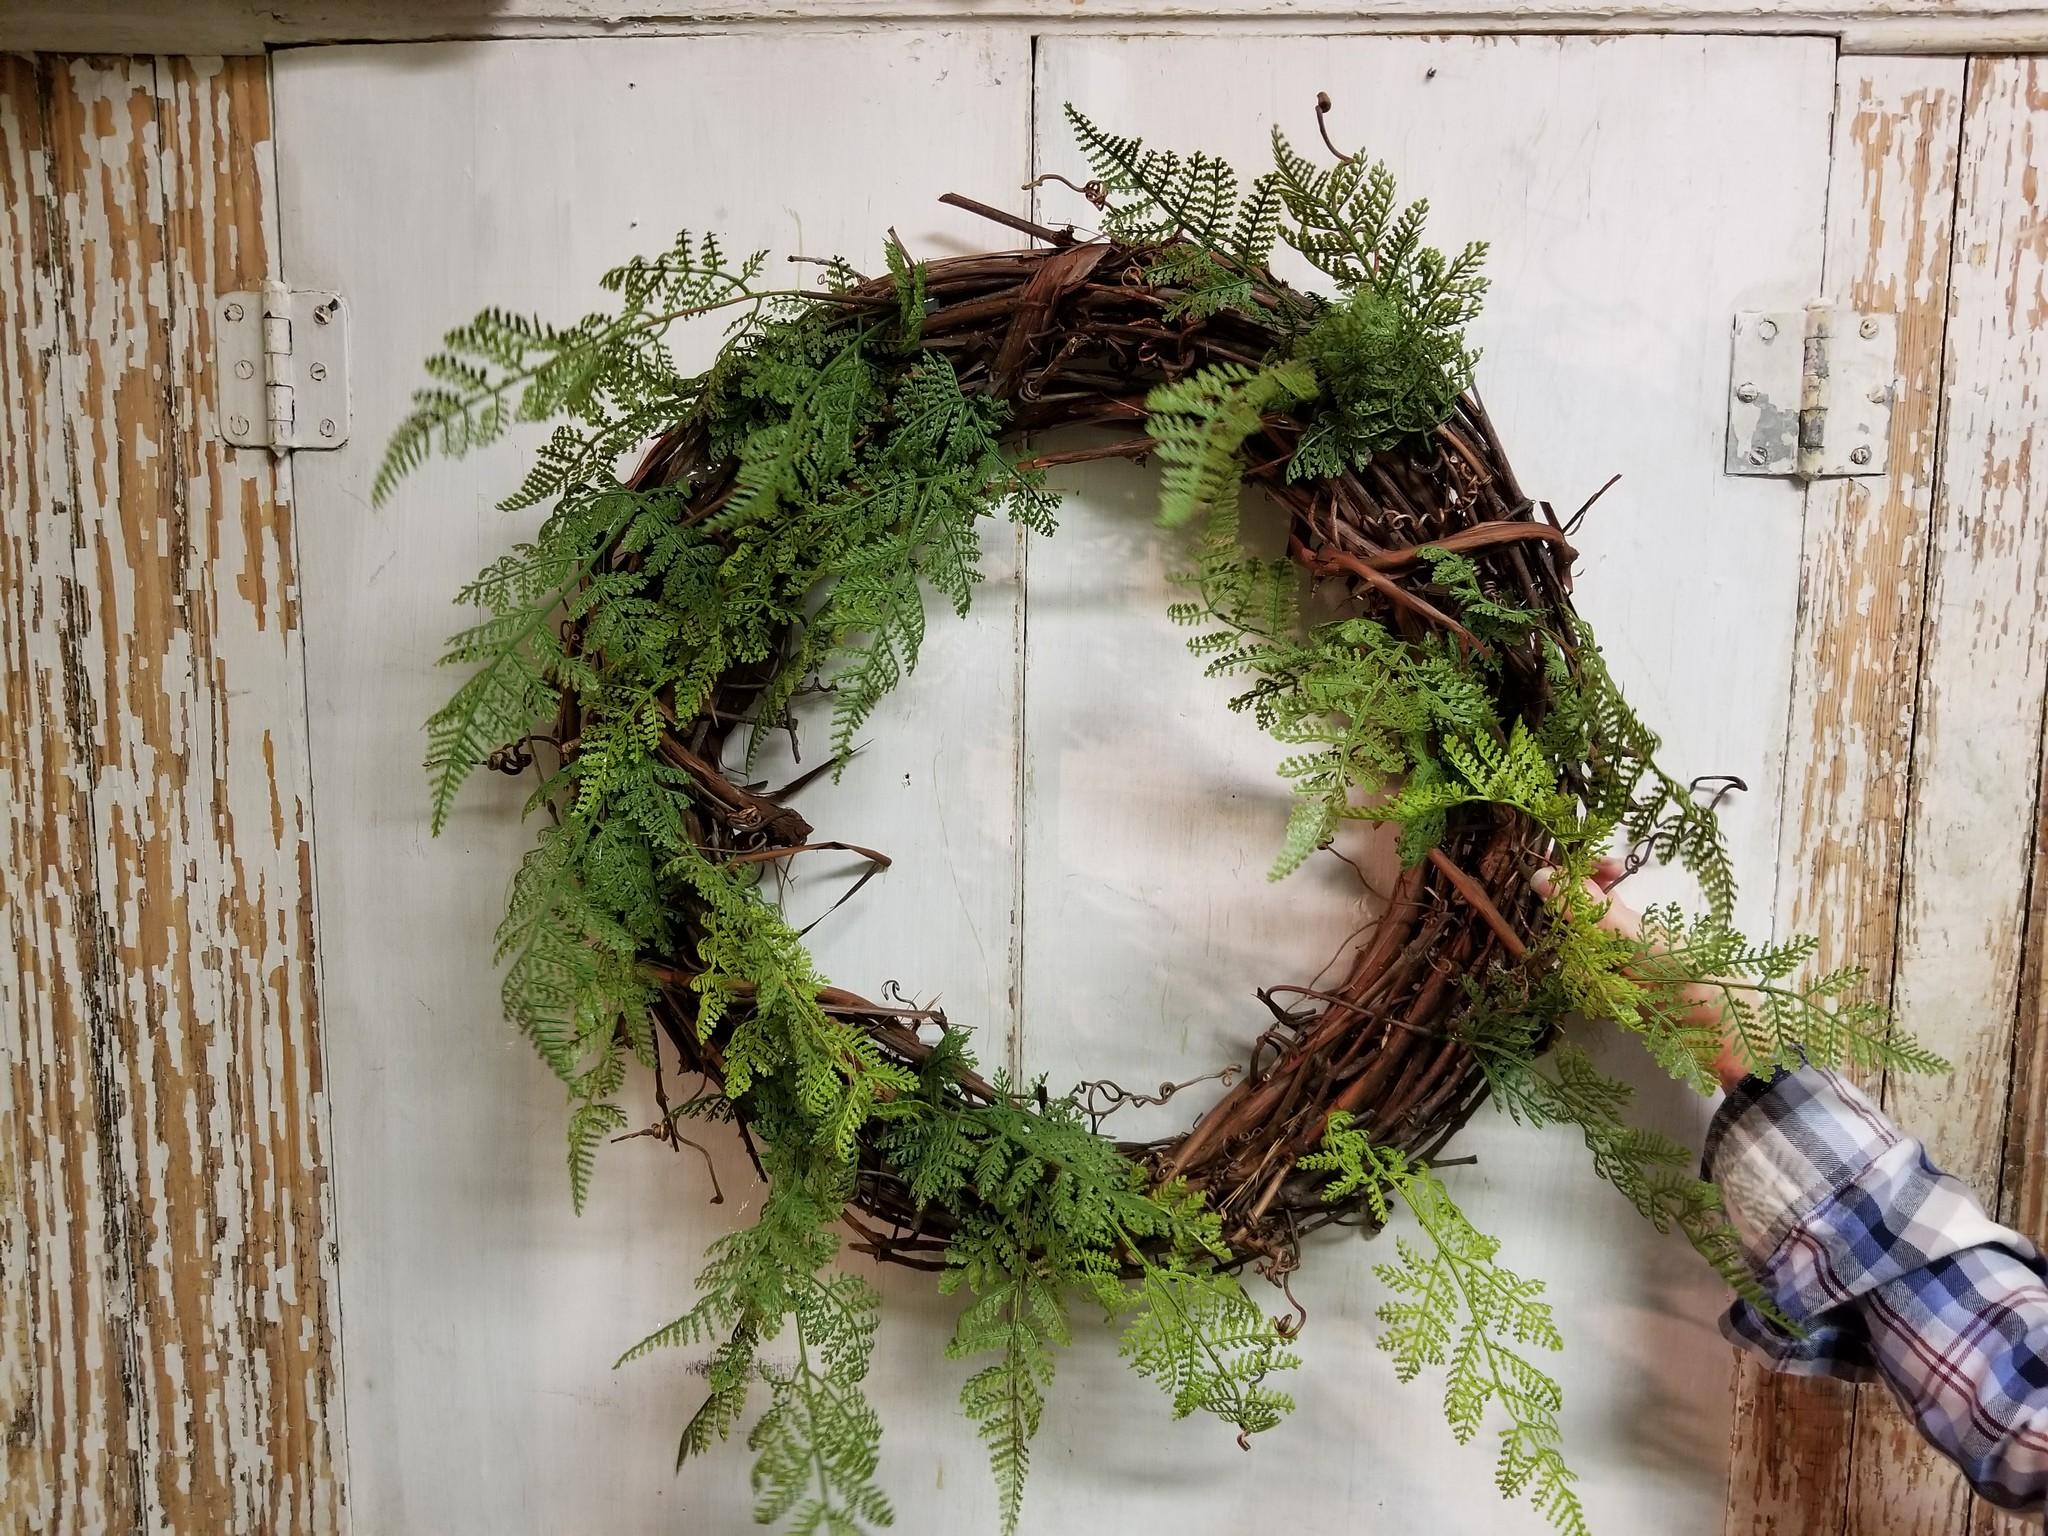 Greenery on wreath